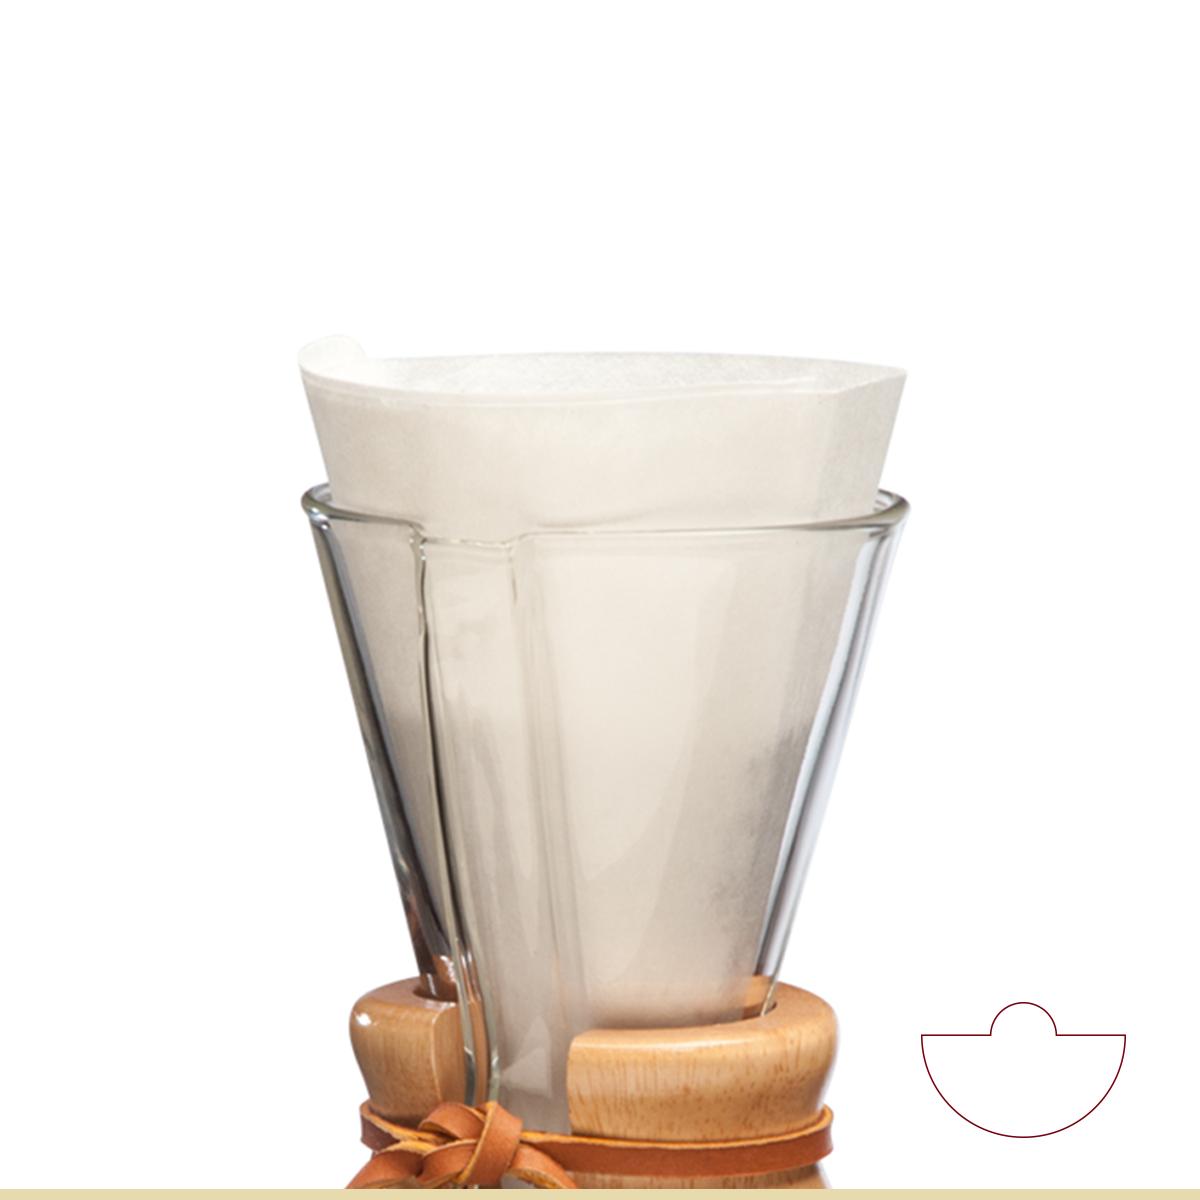 Carolina Coffee CHEMEX® BONDED FILTERS UNFOLDED HALF MOON